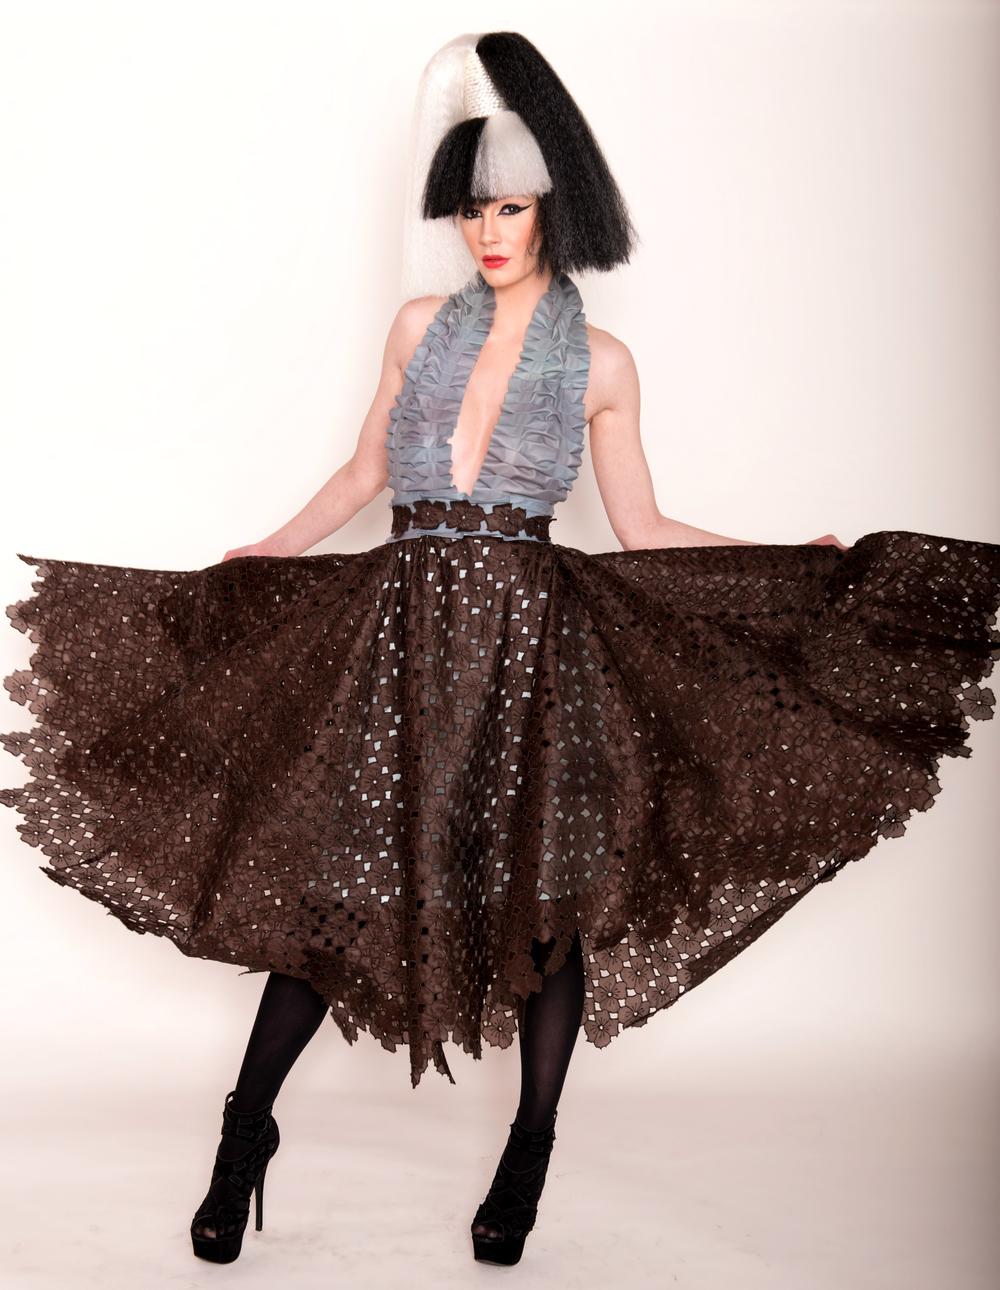 nine-gleyzer-designer-dress-6.jpg